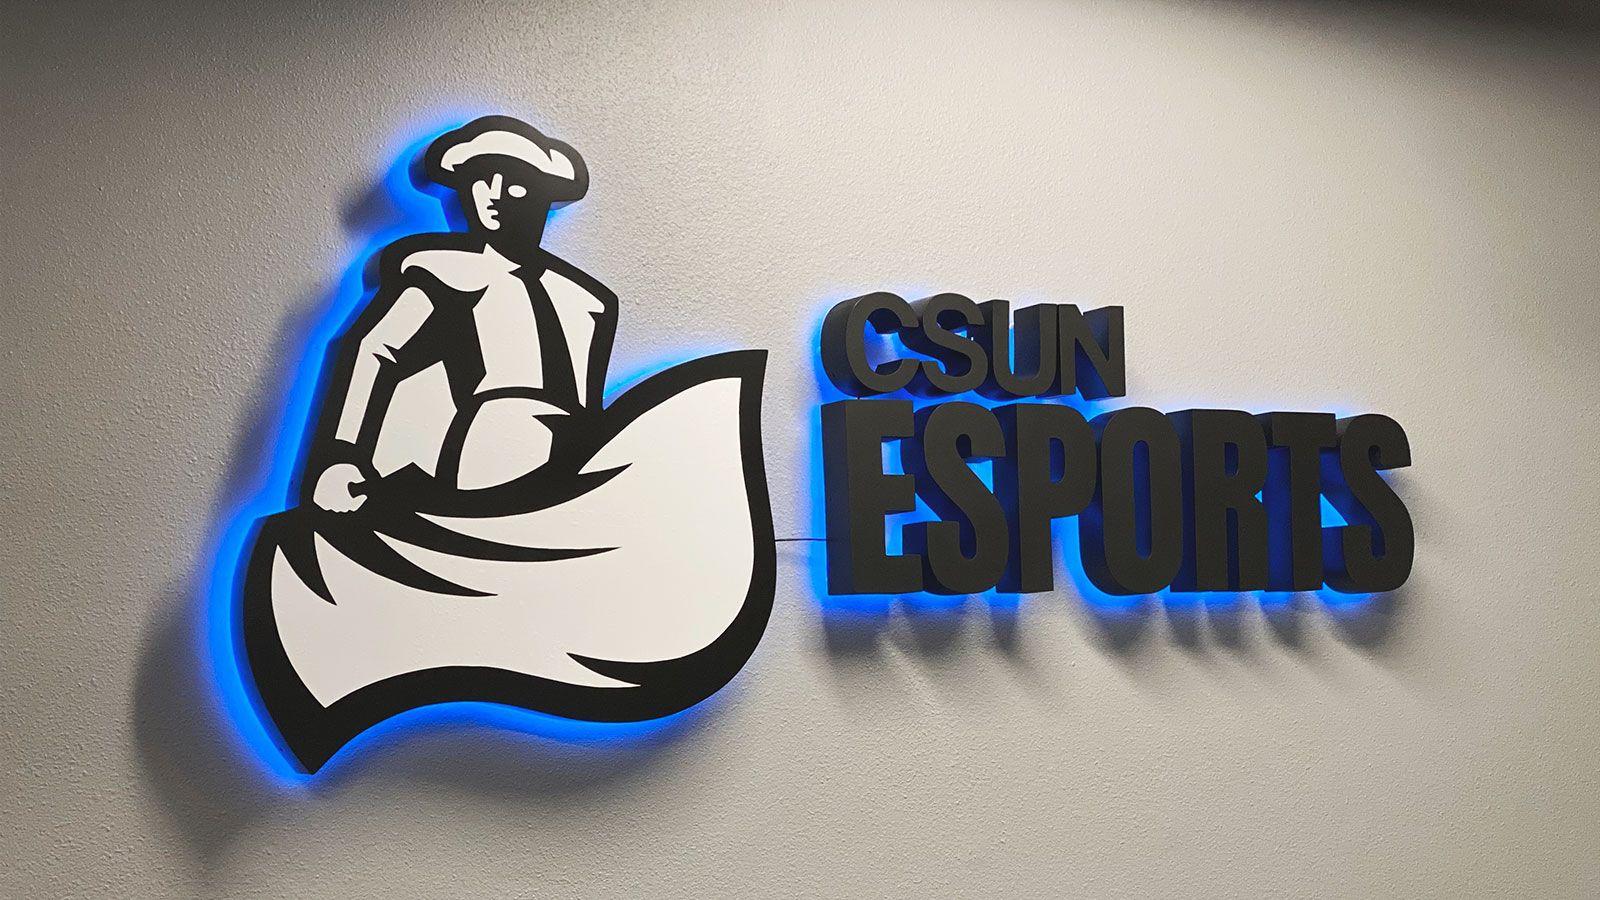 csun esports backlit sign